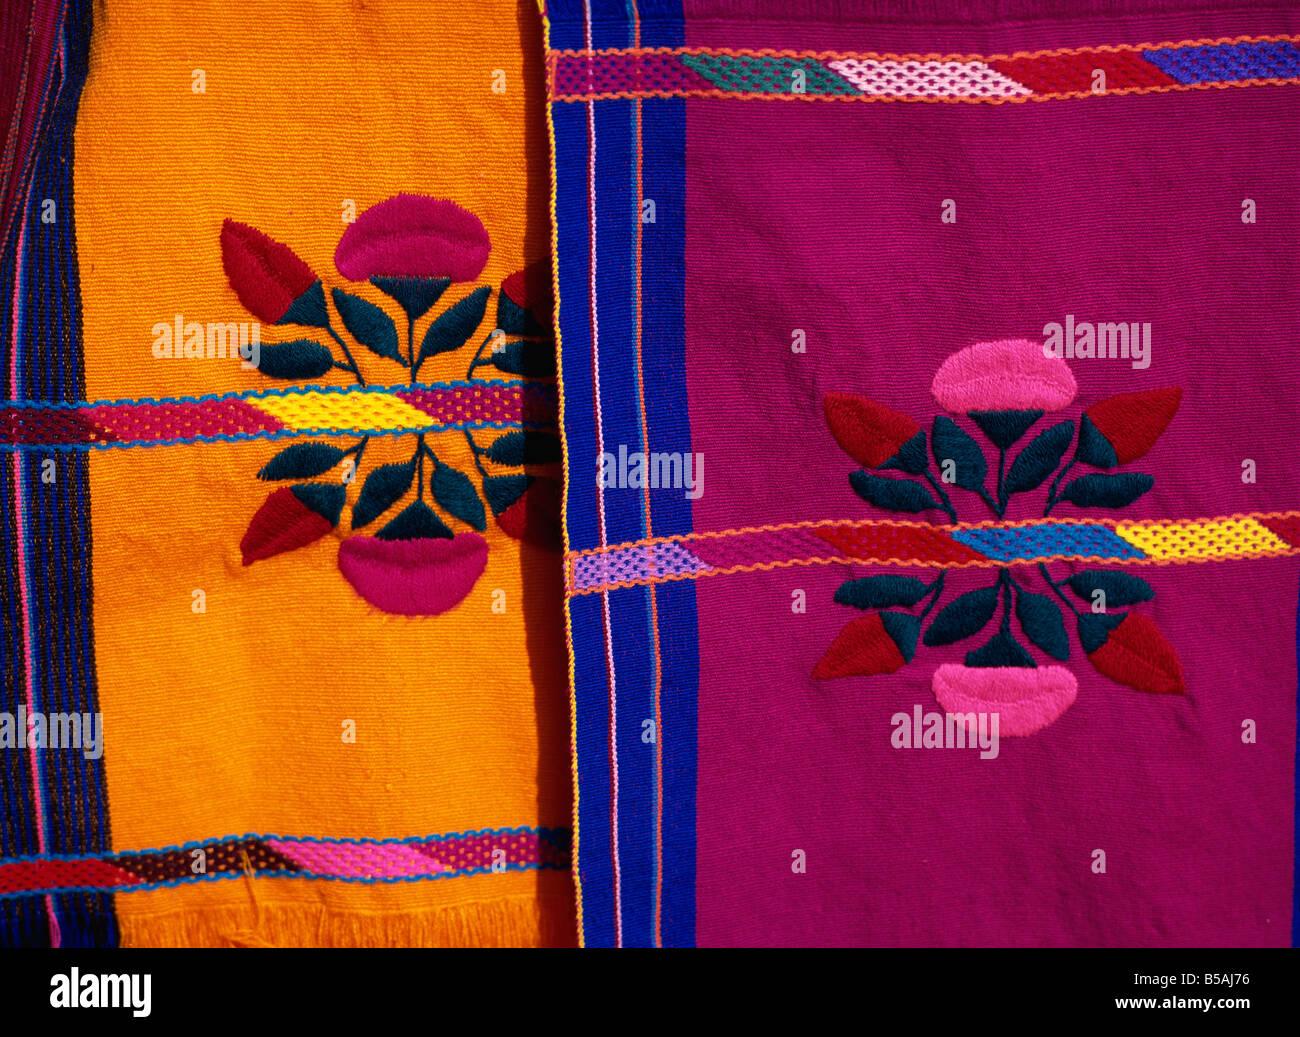 Brightly coloured craft rugs on display at San Cristobal de las Casas, in Chiapas, Mexico, North America - Stock Image